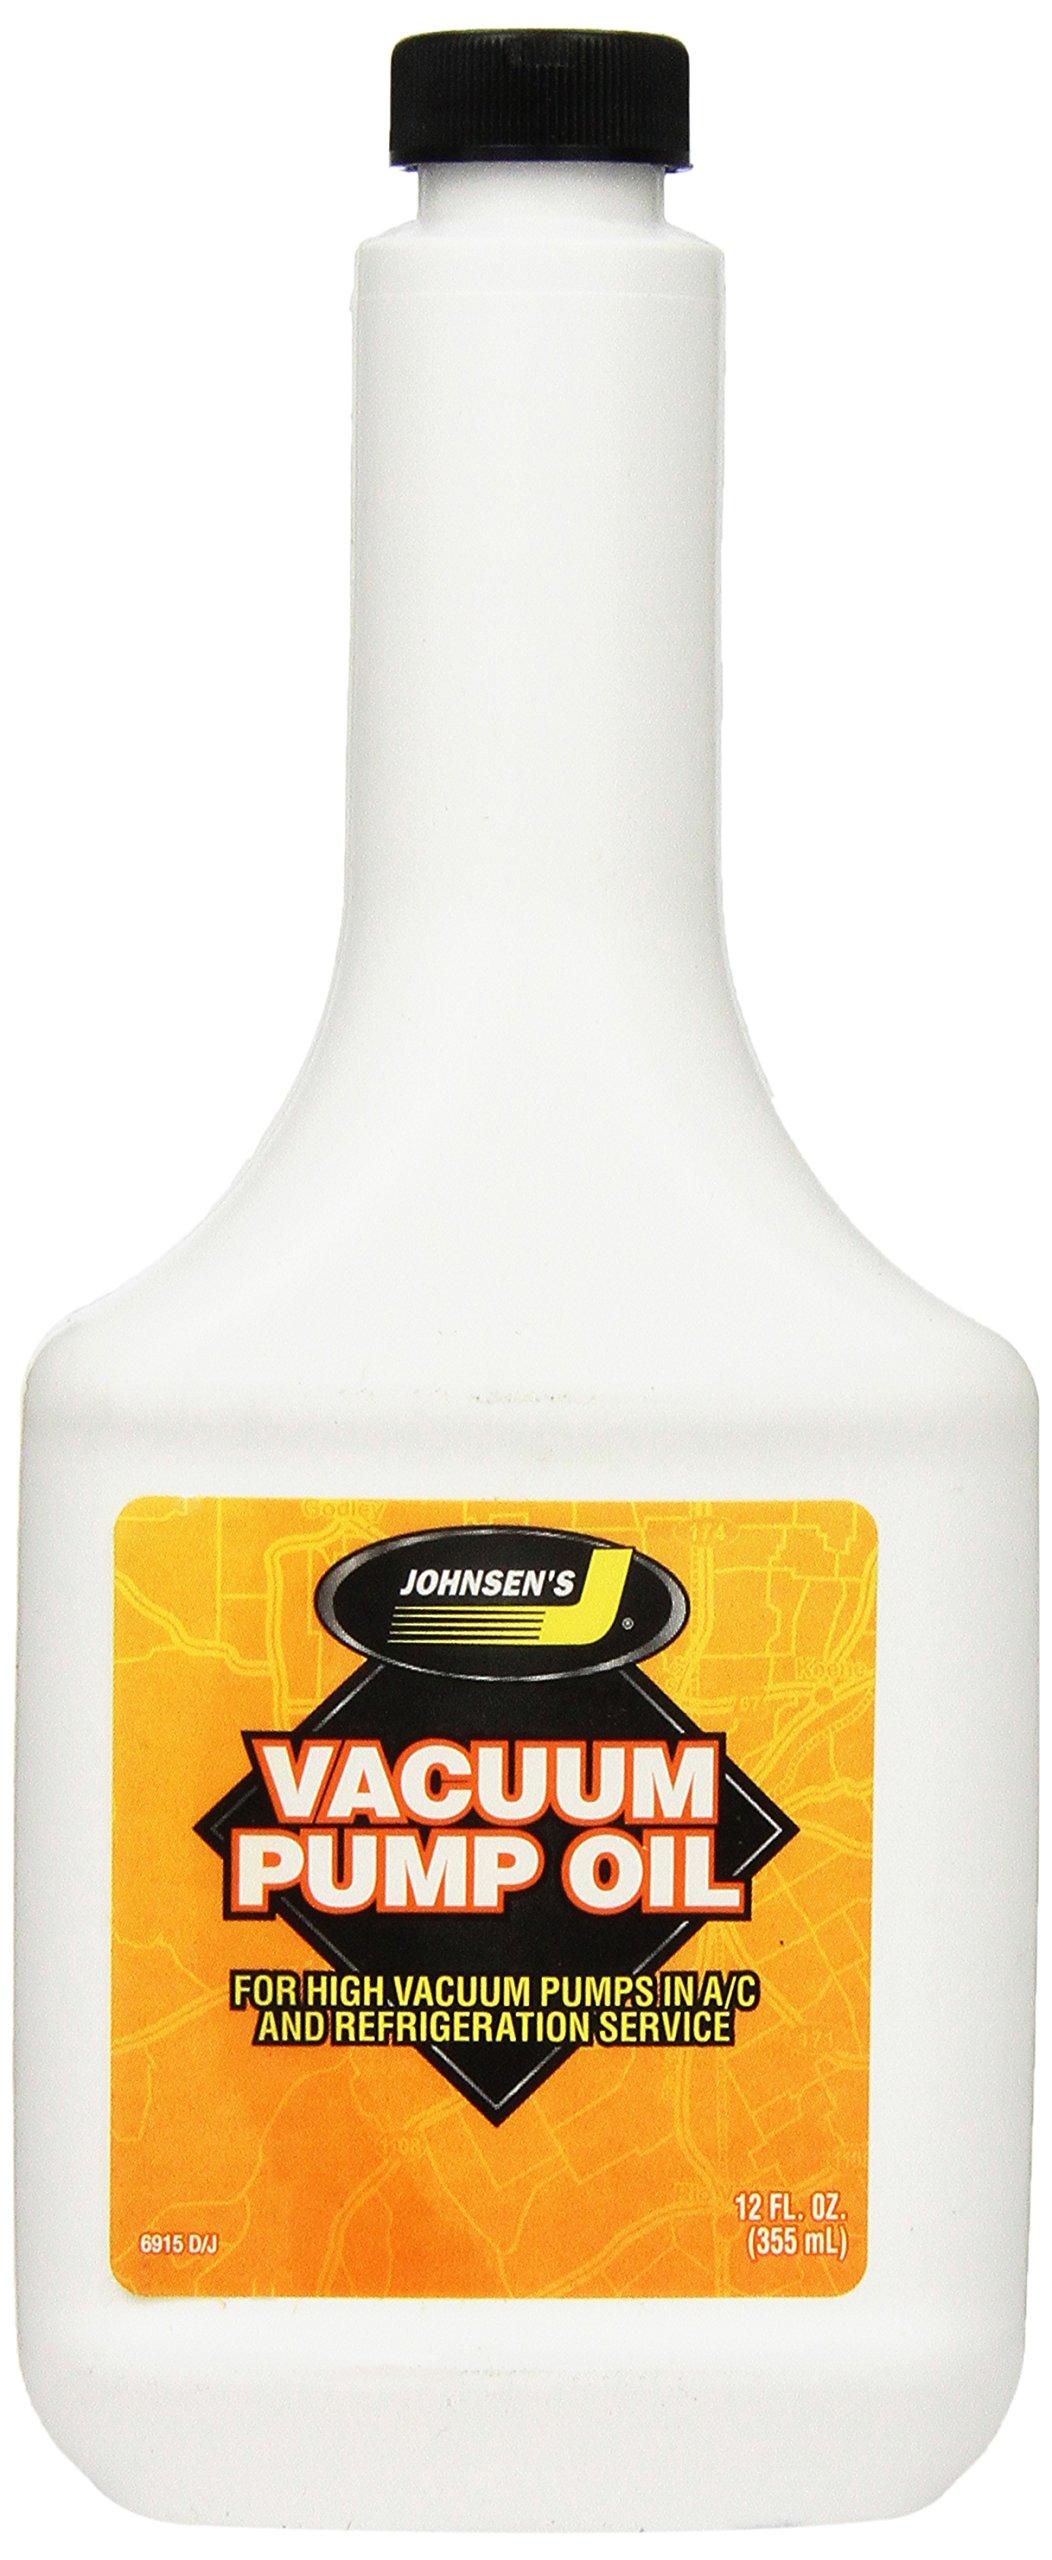 Johnsen's 6915 Vacuum Pump Oil - 12 oz. by Johnsen's